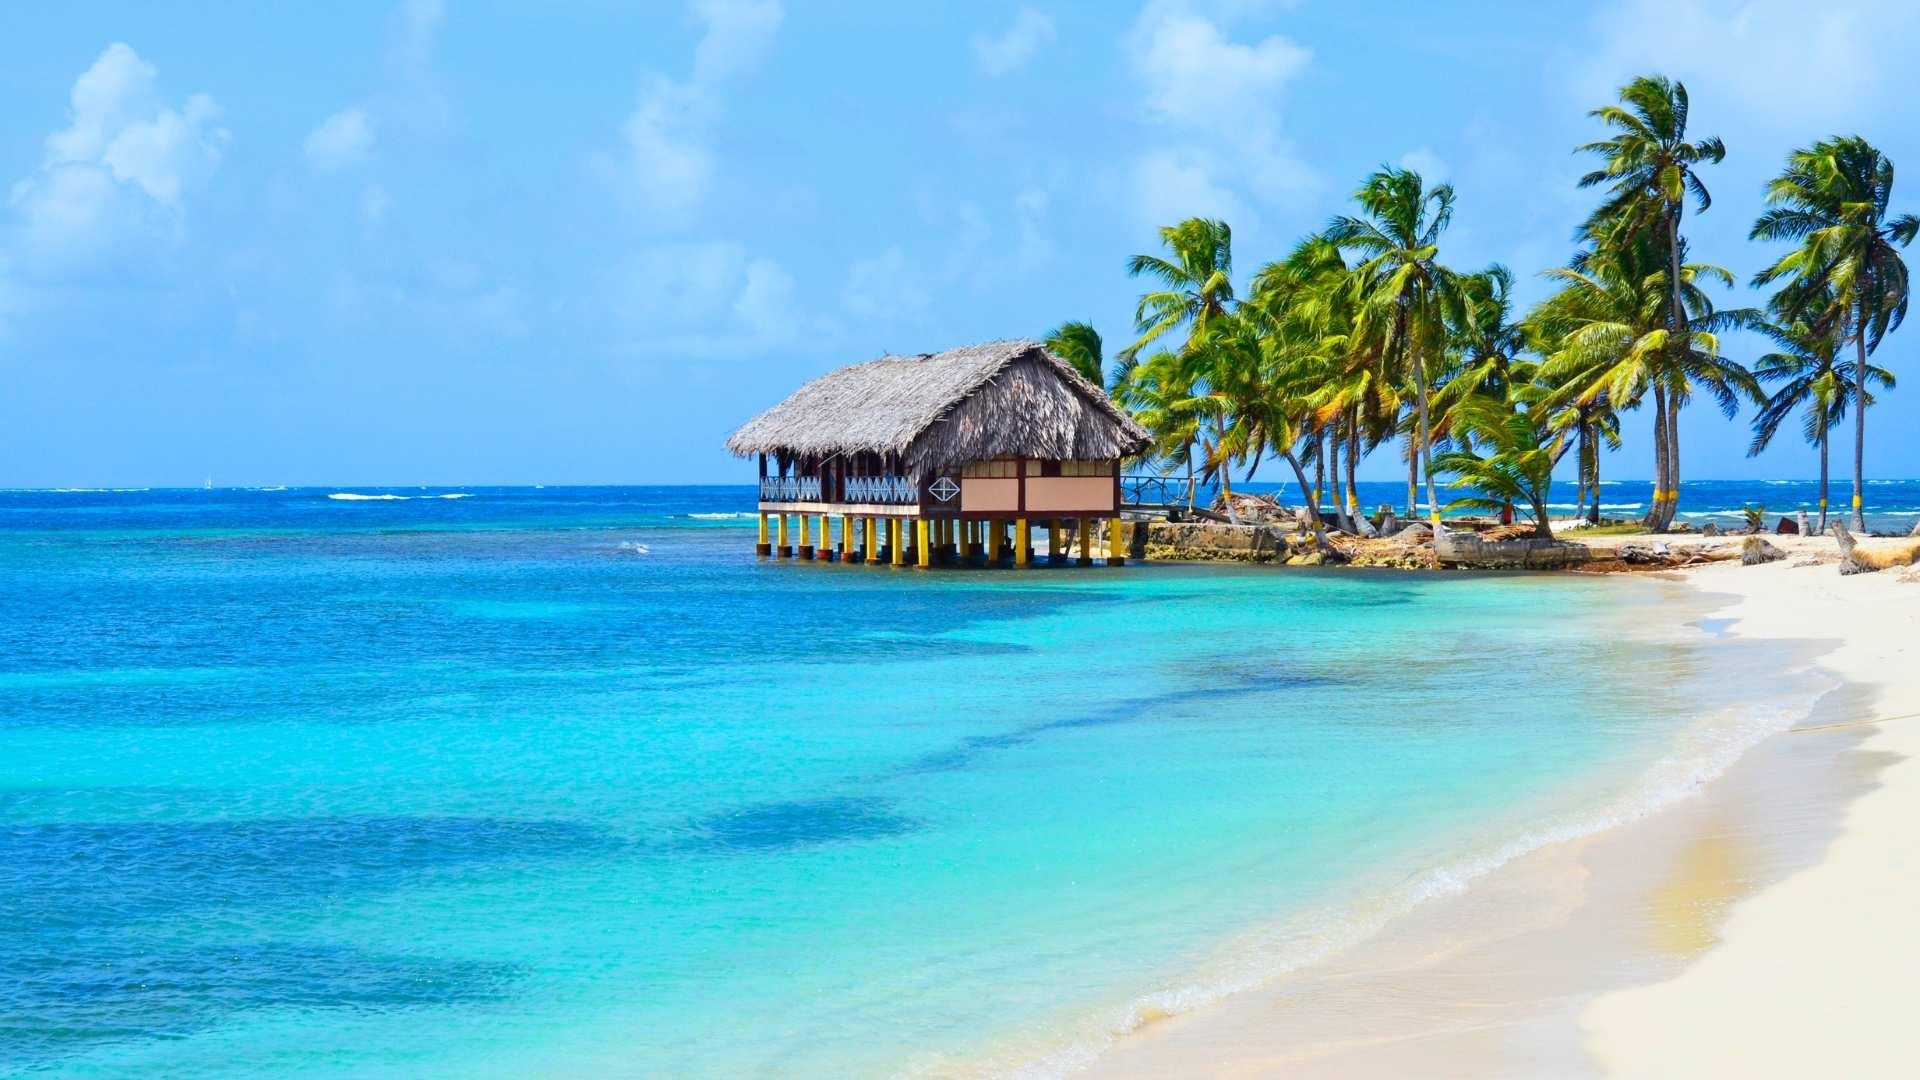 Panama overwater bungalows